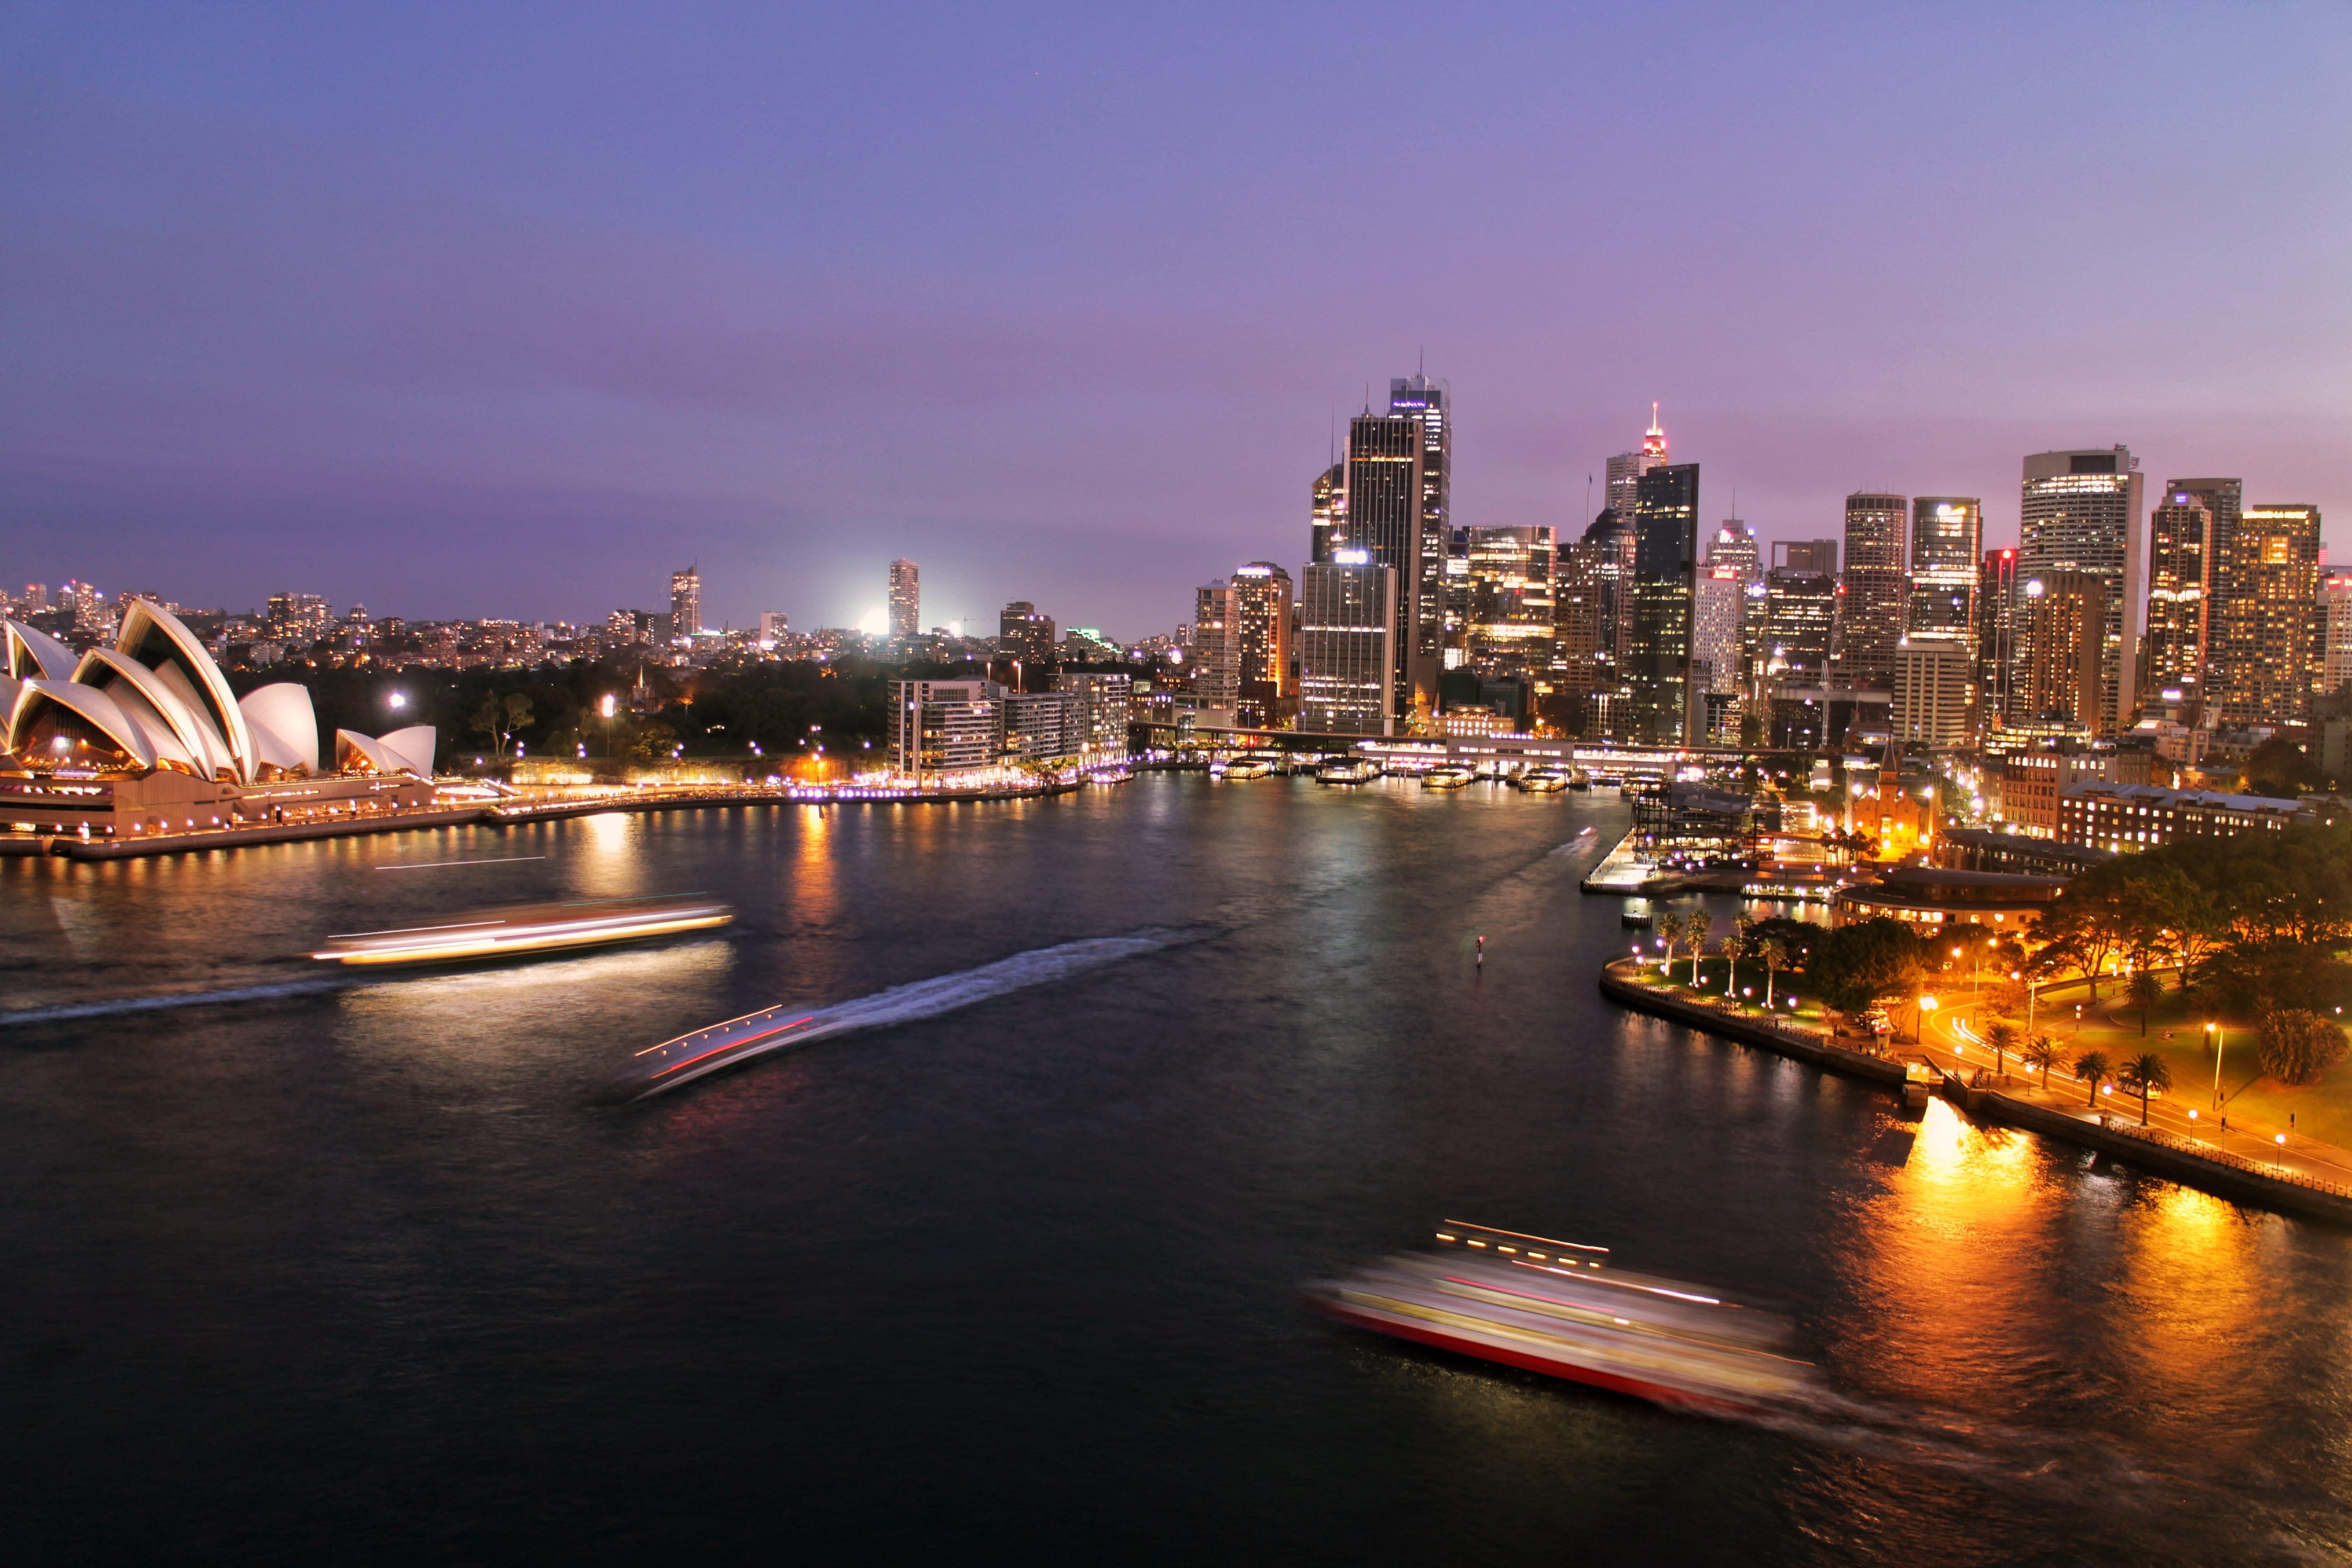 Nighttime view of Sydney, Australia